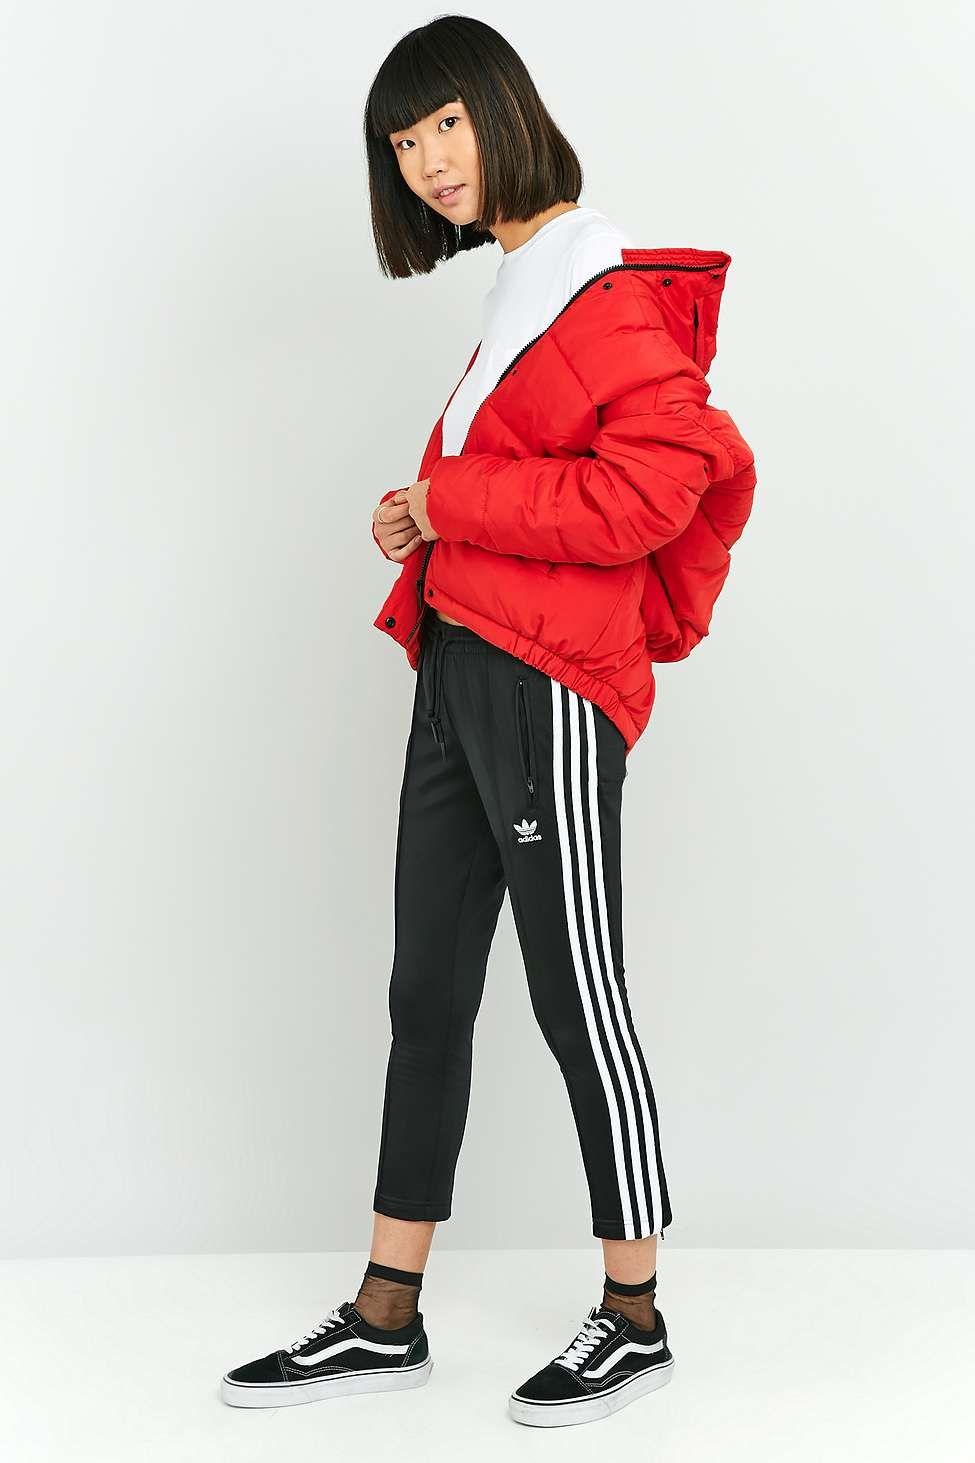 costume adidas 3 stripes